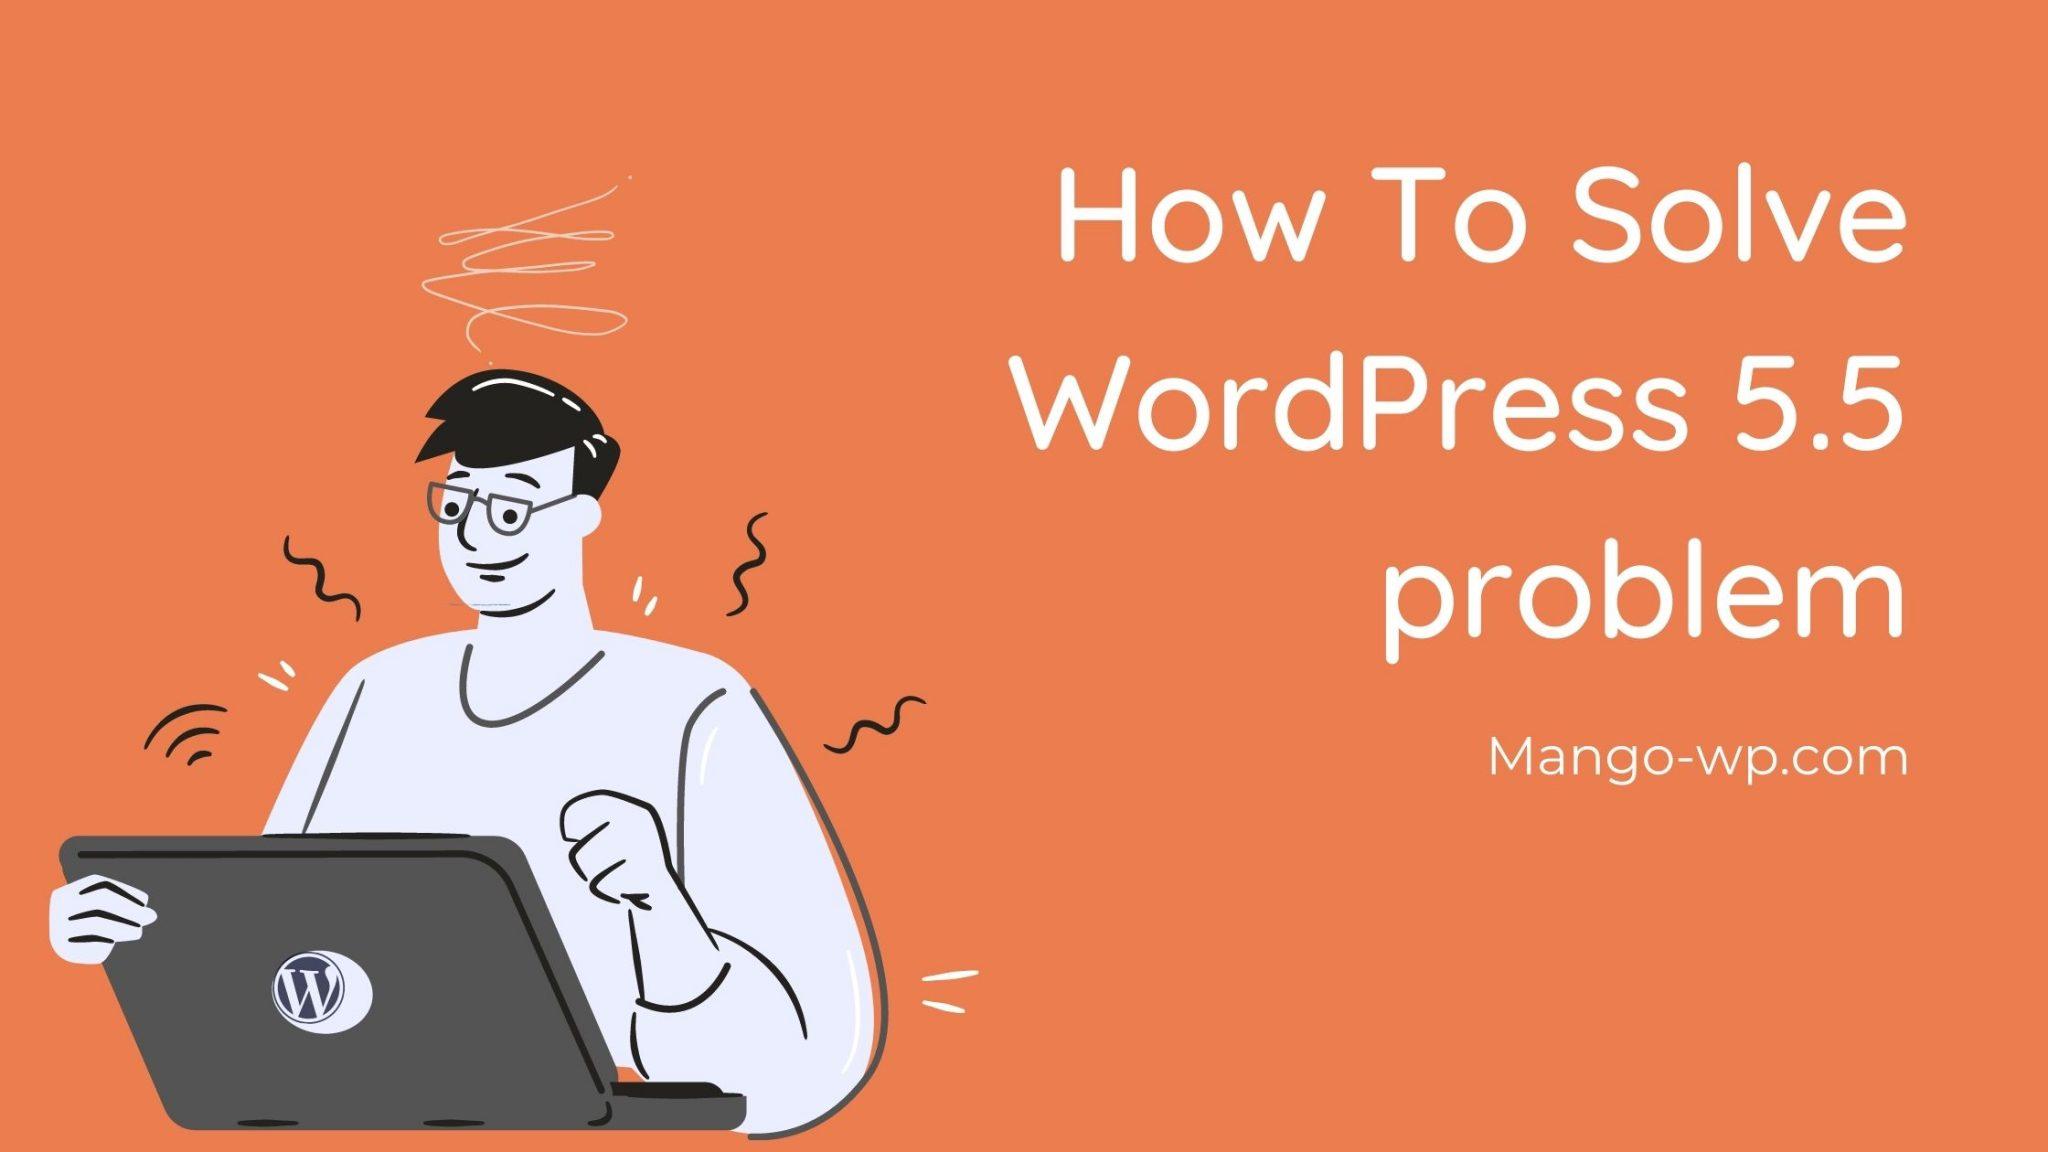 Solution for WordPress 5.5 problem